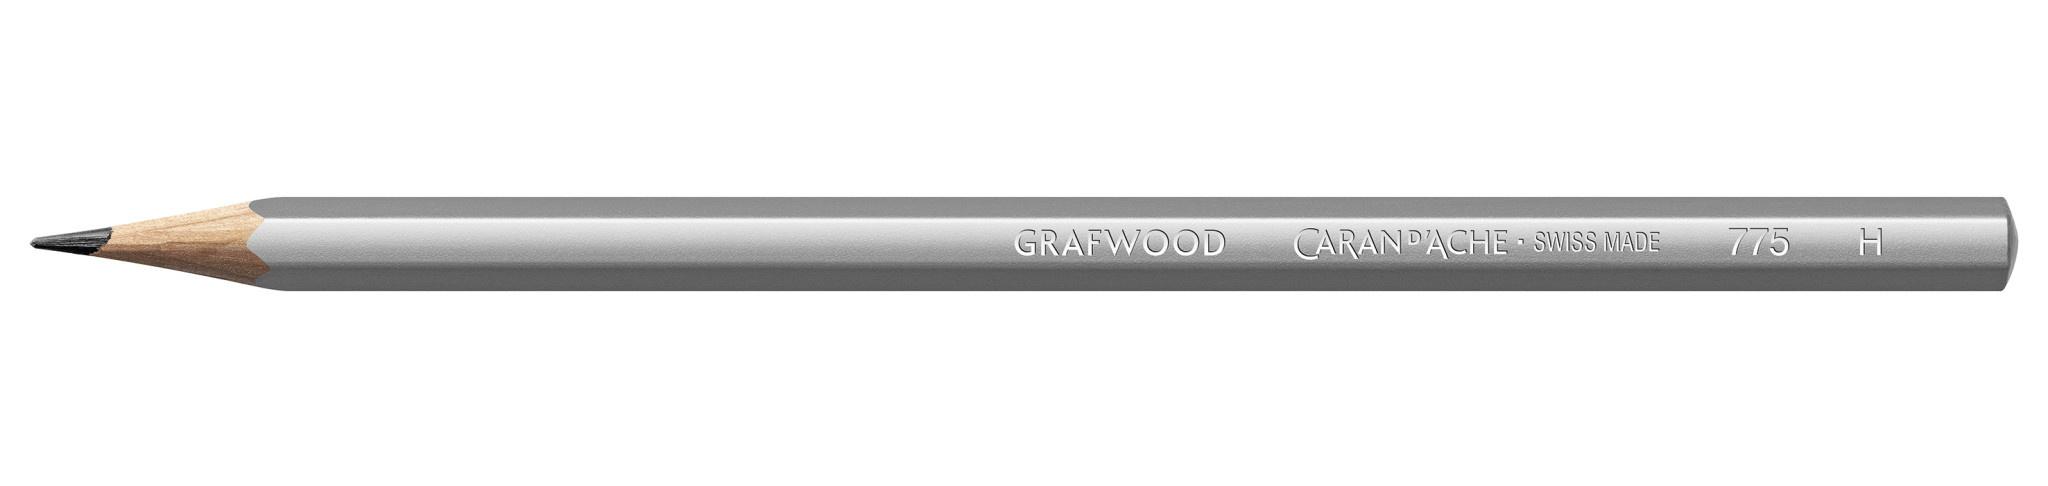 Caran d'Ache caran d'ache grafwood H